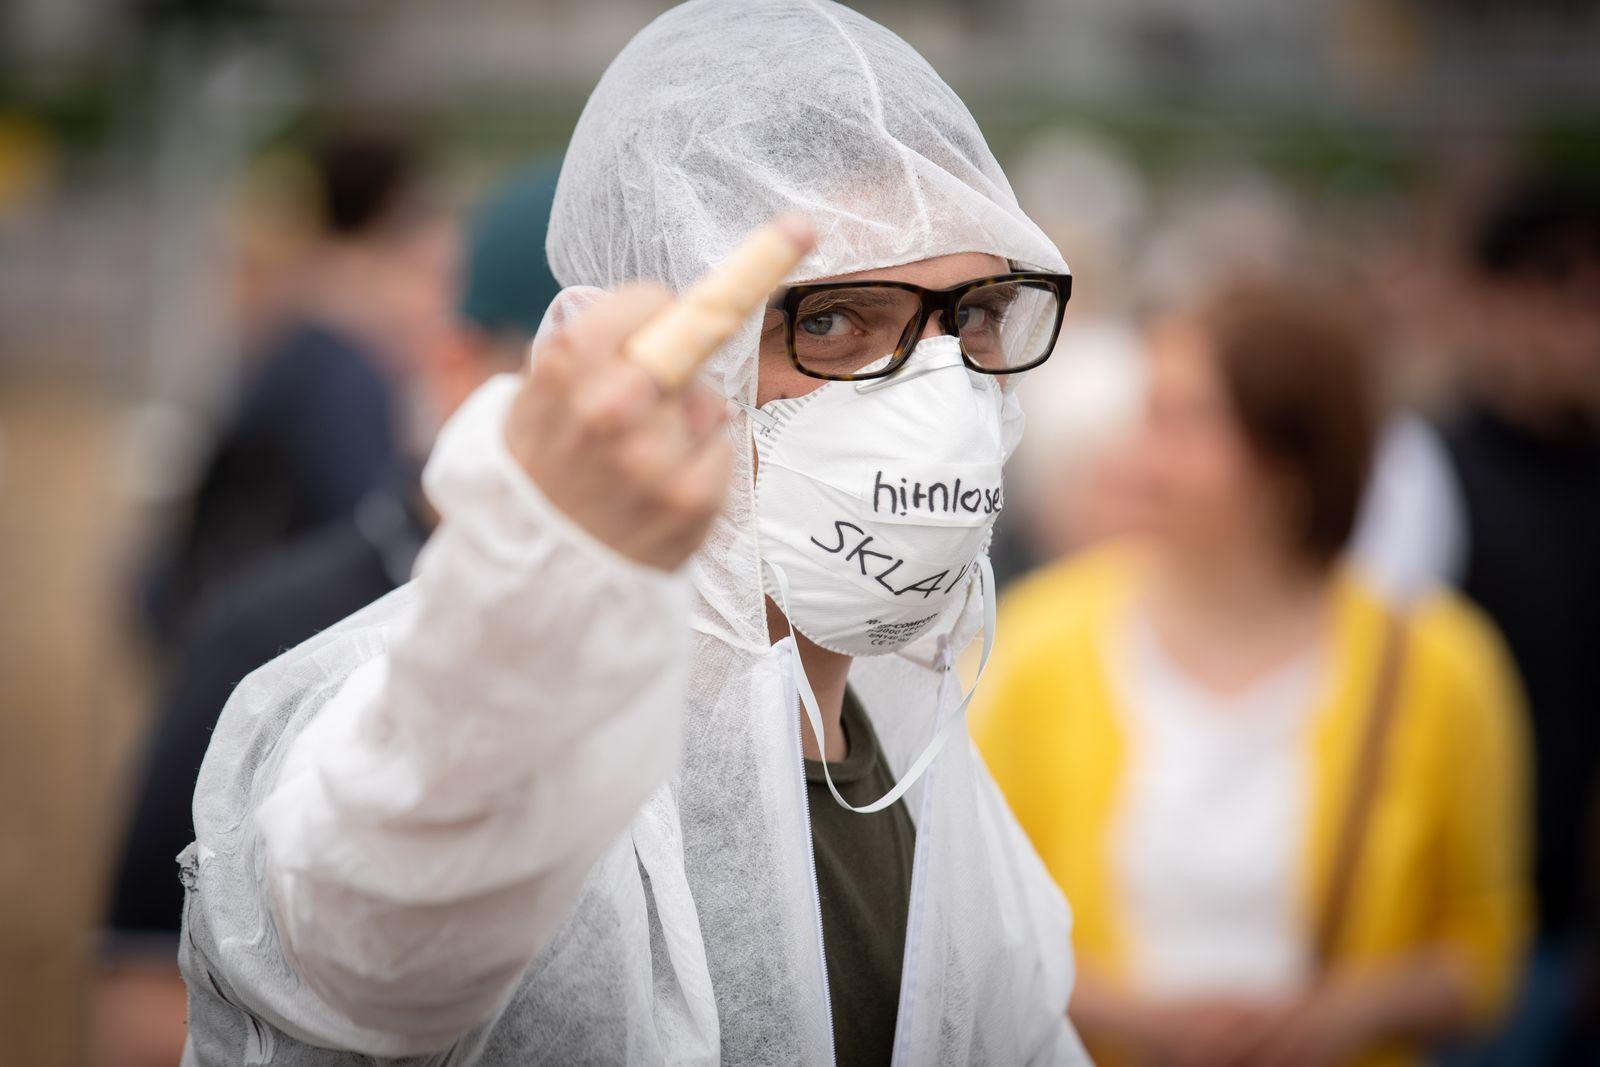 Tausende protestieren in Stuttgart gegen Corona-Maßnahmen